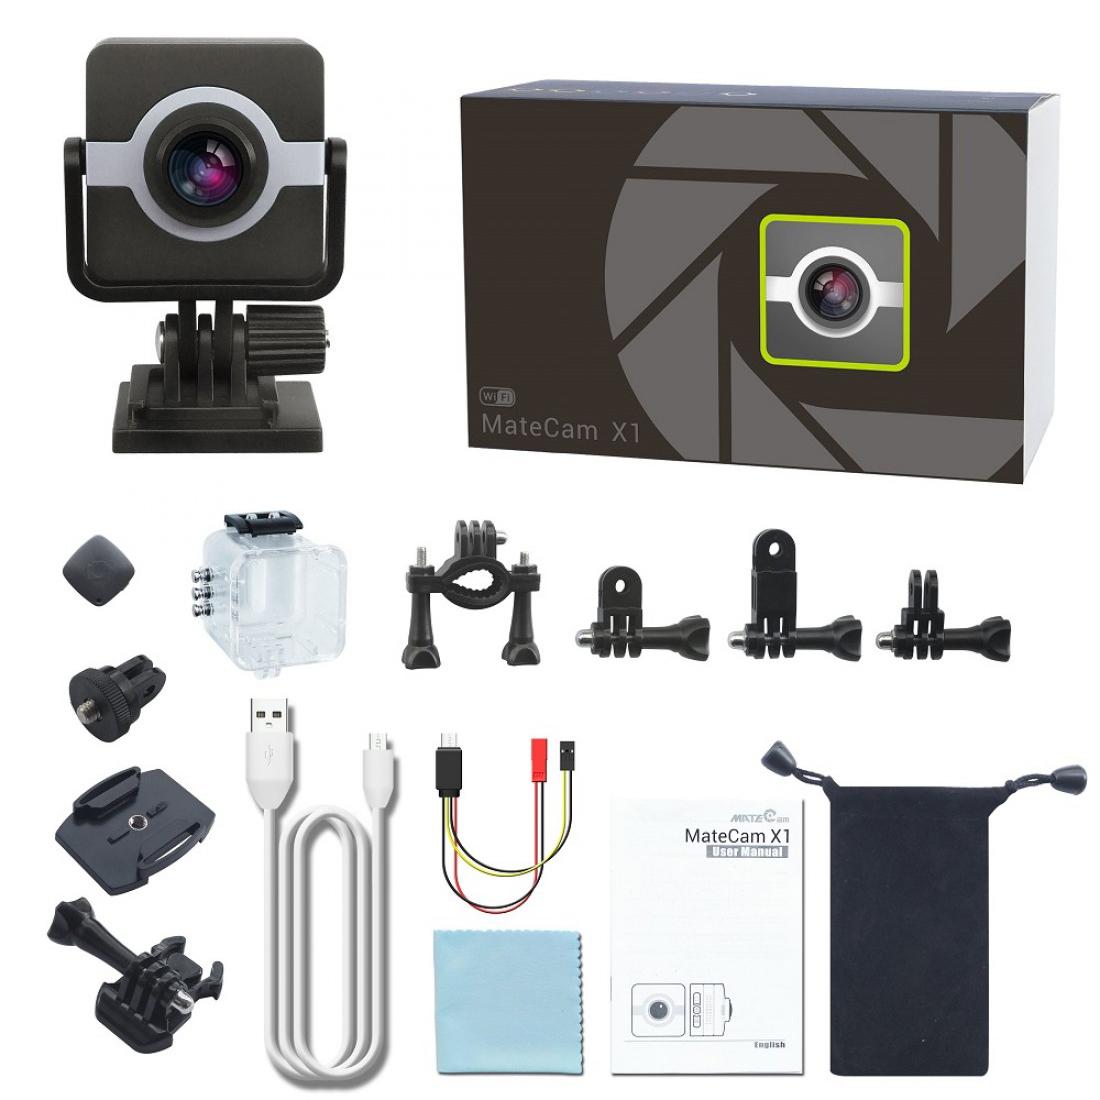 Matecam X1 Car Dashboard Camera Cam recorder WIFI Sports Action Camera 4K-HI Ultra HD Waterproof DV Camcorder 16MP 160 Degree Wide Angle WIFIG-SensorGyro StabilizationMotion DetectionRemote control RC cam Bike Helmet Cam  ( (4)